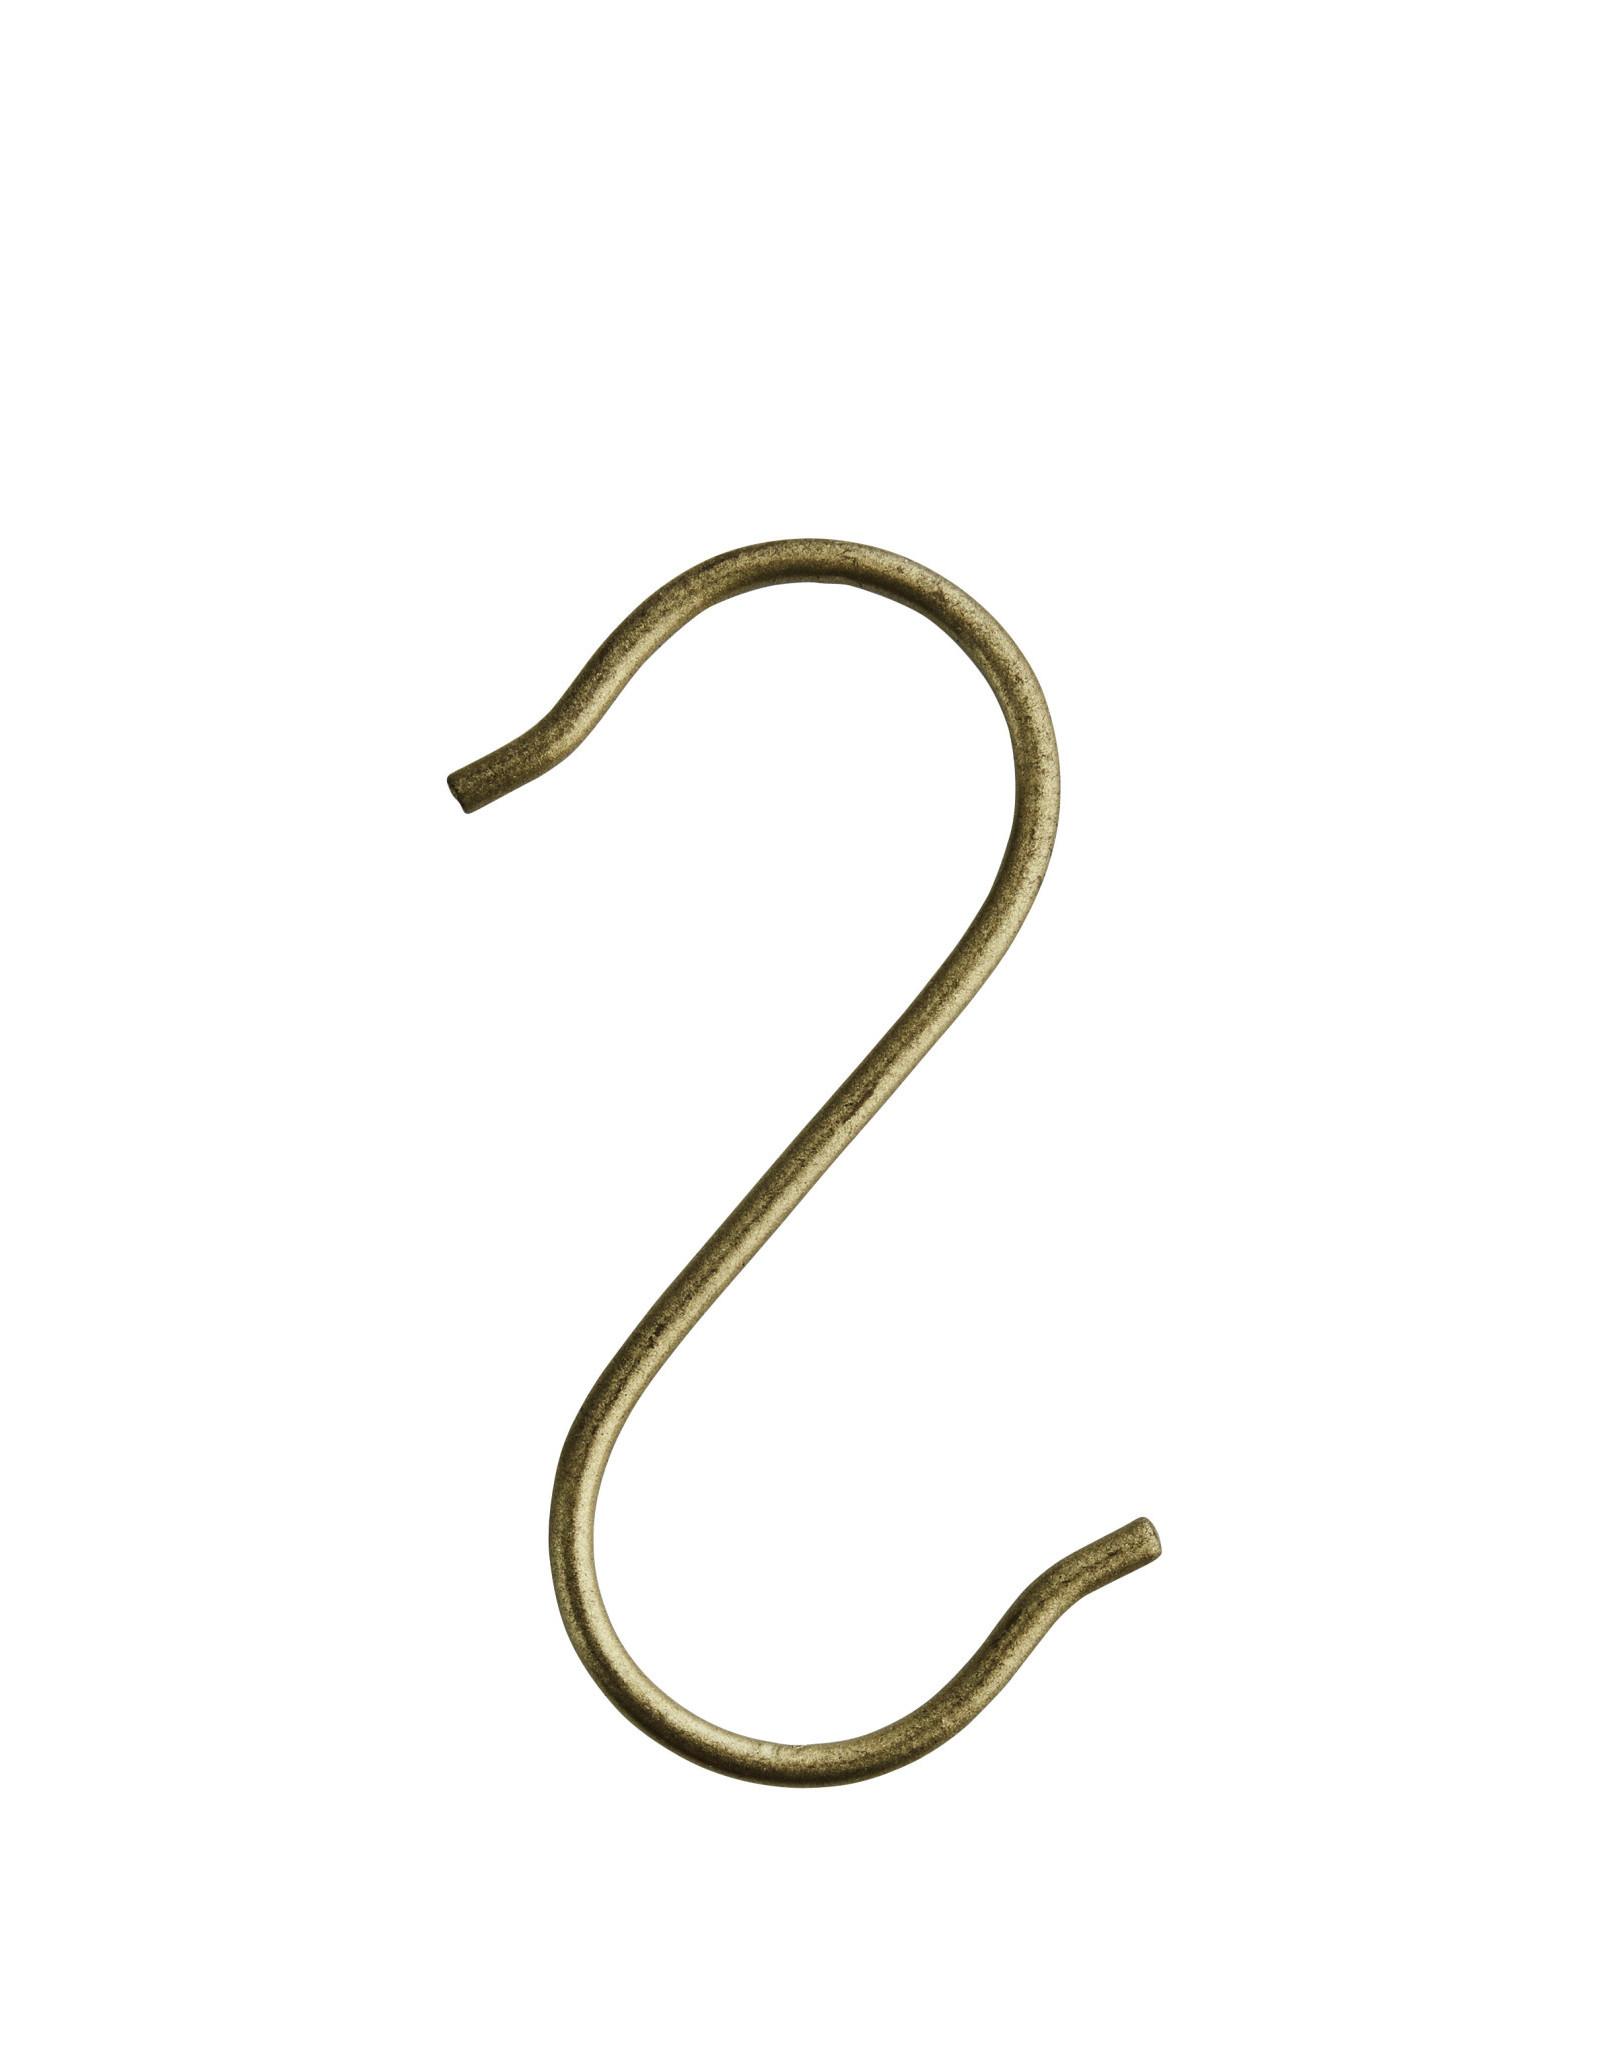 Madam Stoltz S-hook 8,5x4 cm - Iron - Brass [S]